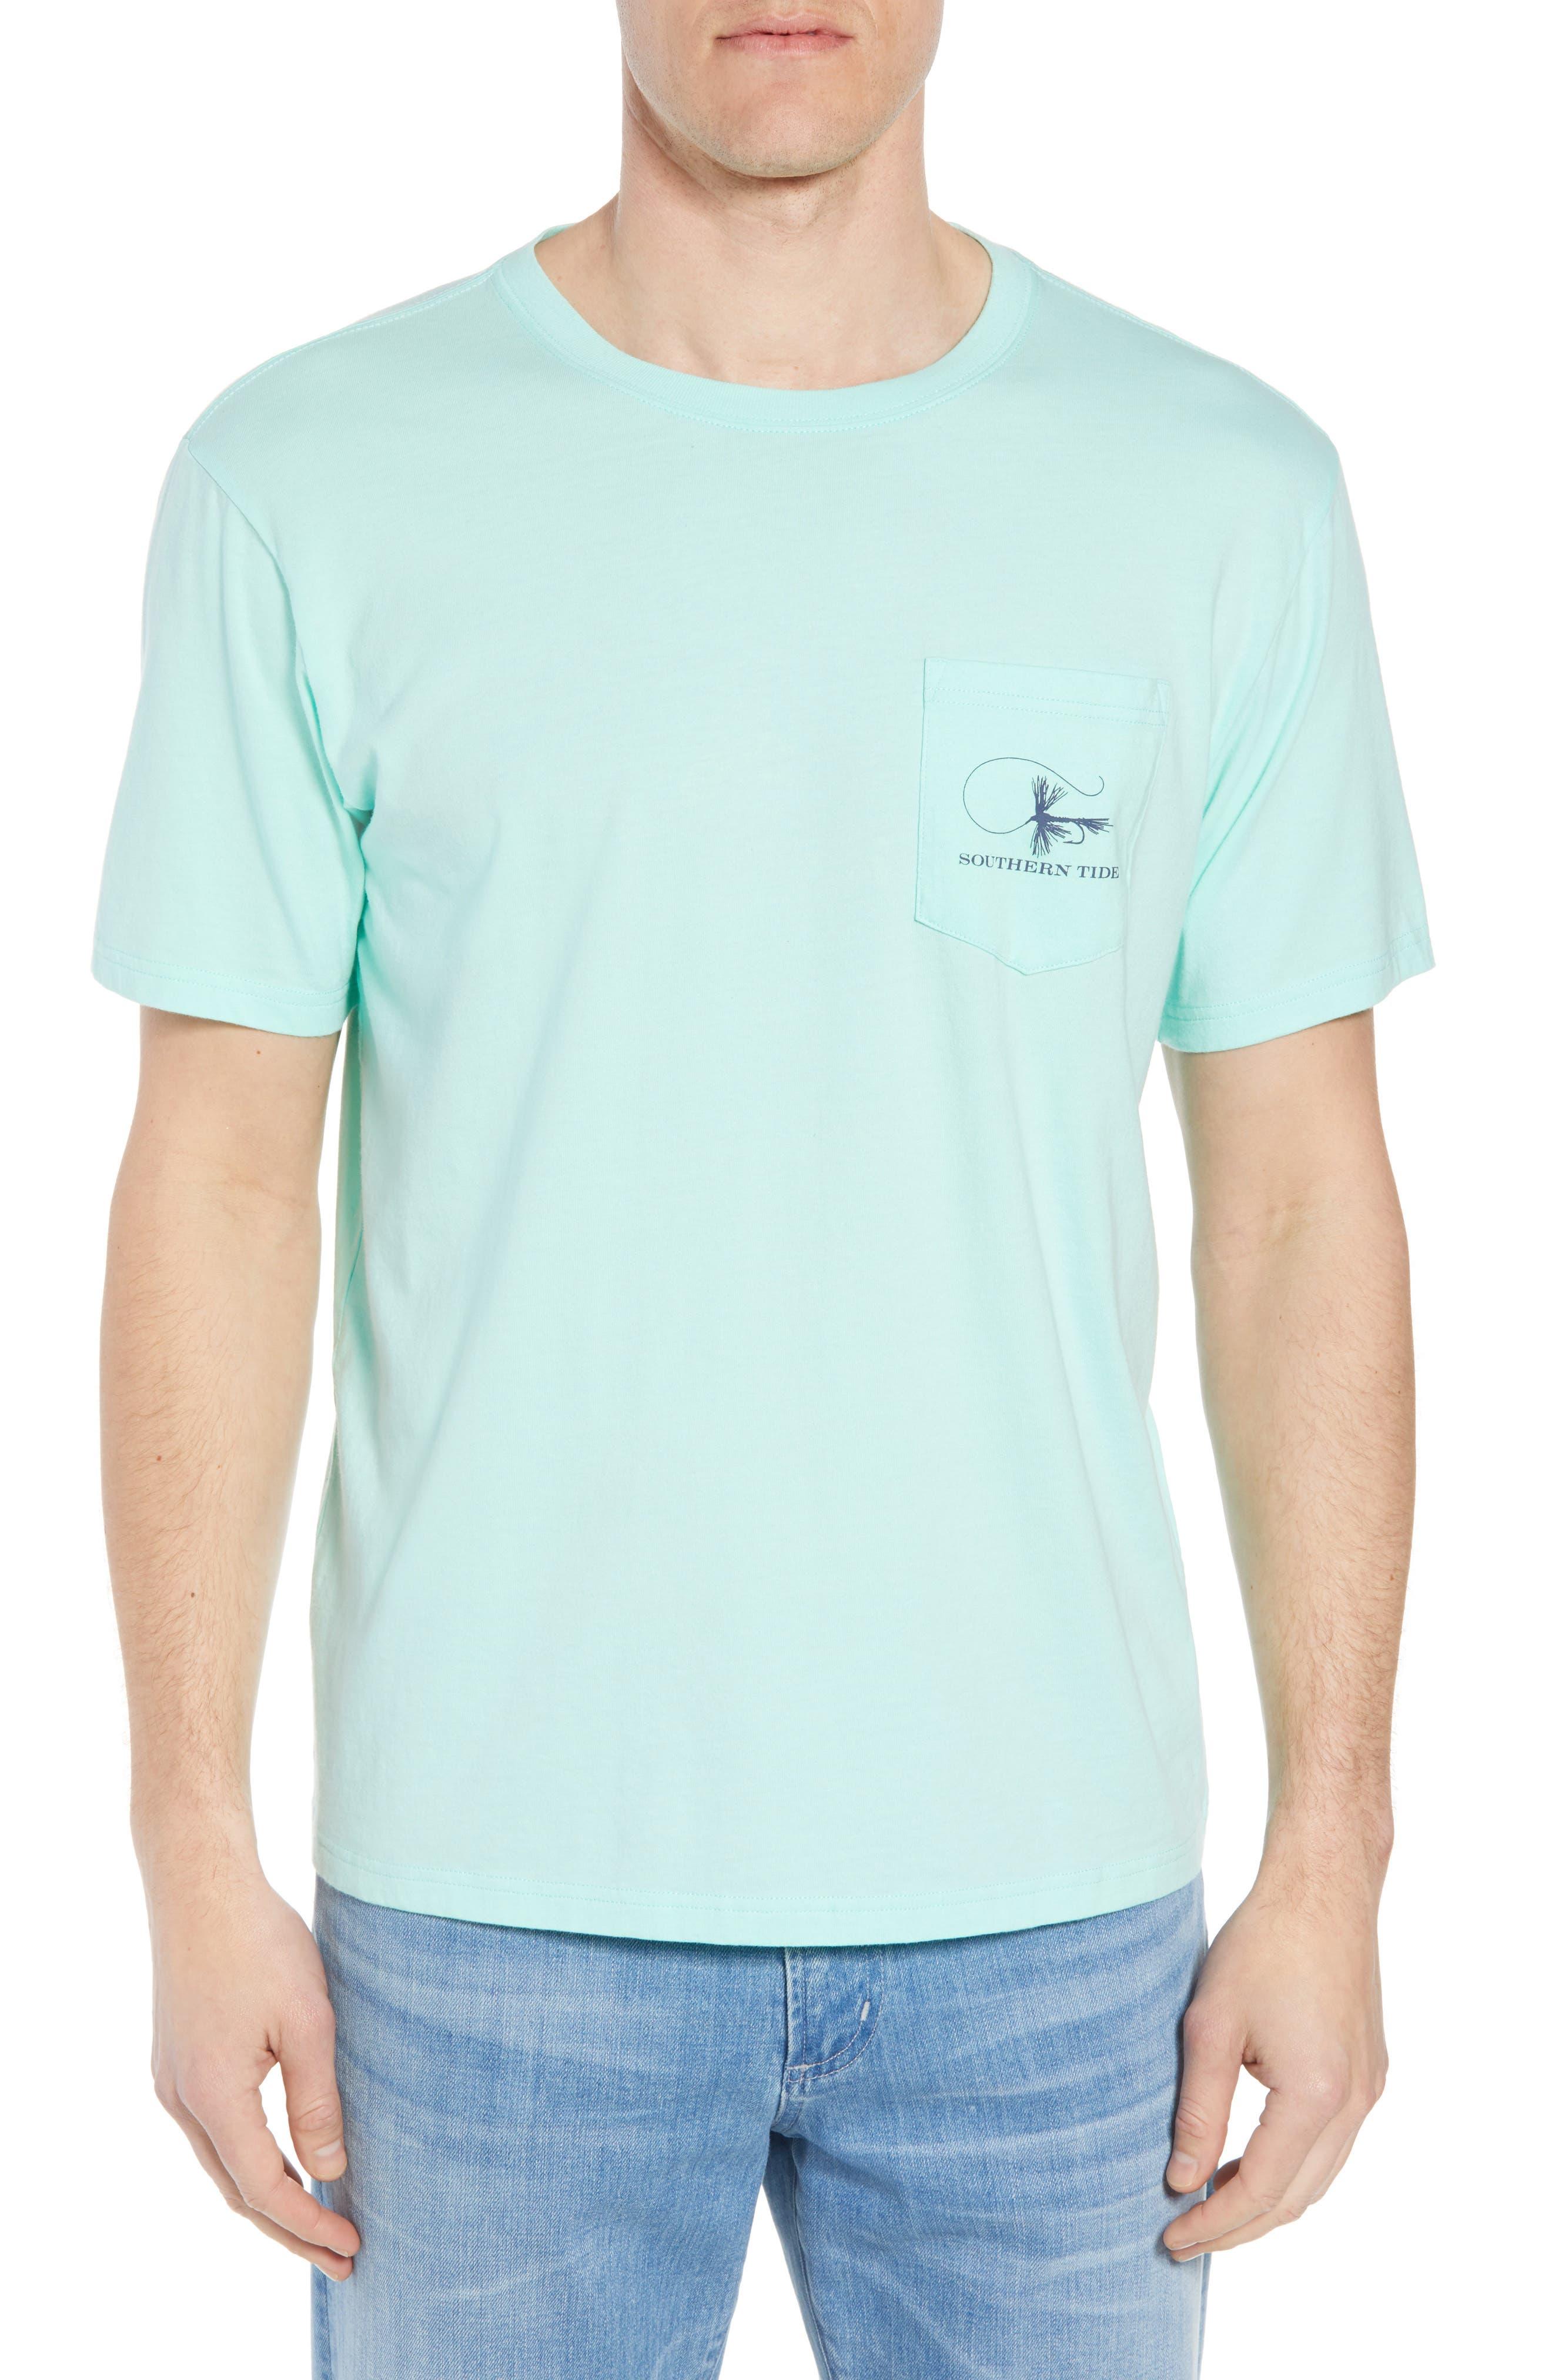 Southern Tide Fly Fishing Regular Fit Pocket T-Shirt